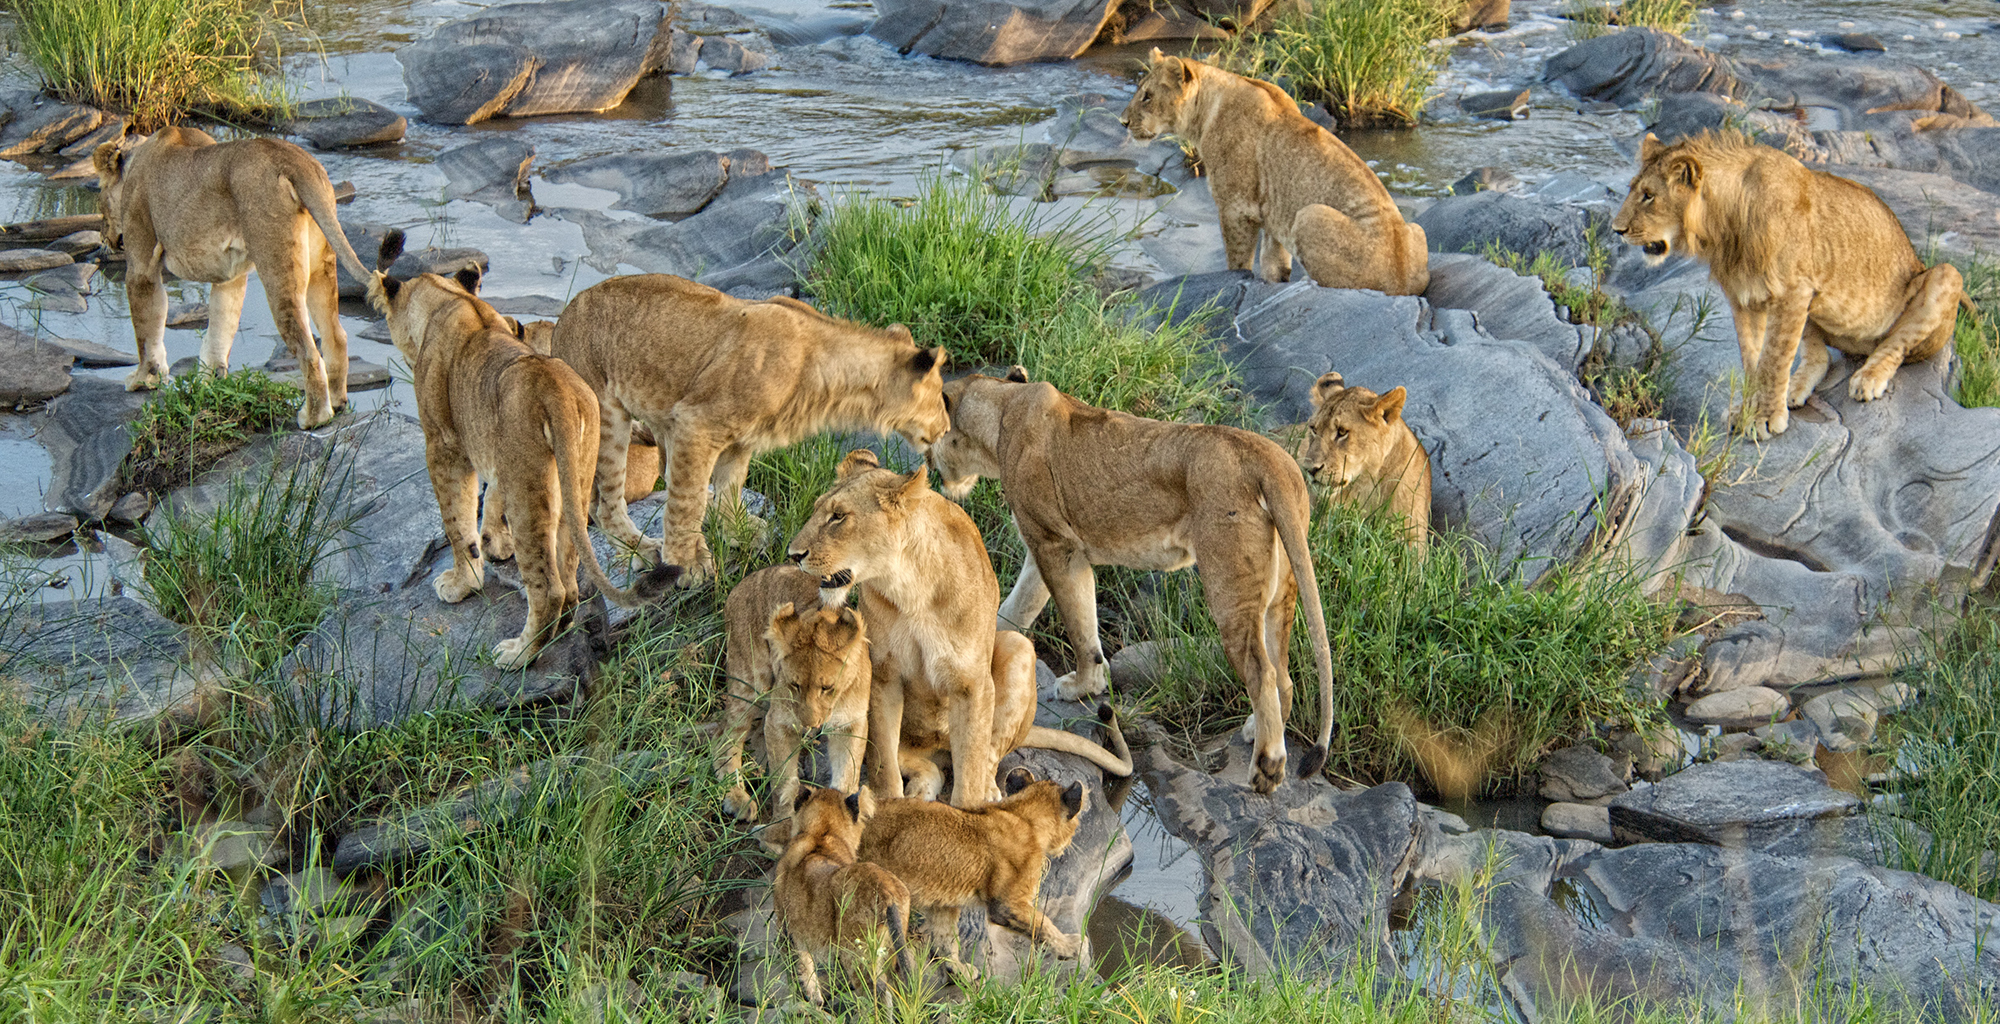 Kenya-Rekero-Tent-Camp-Lions